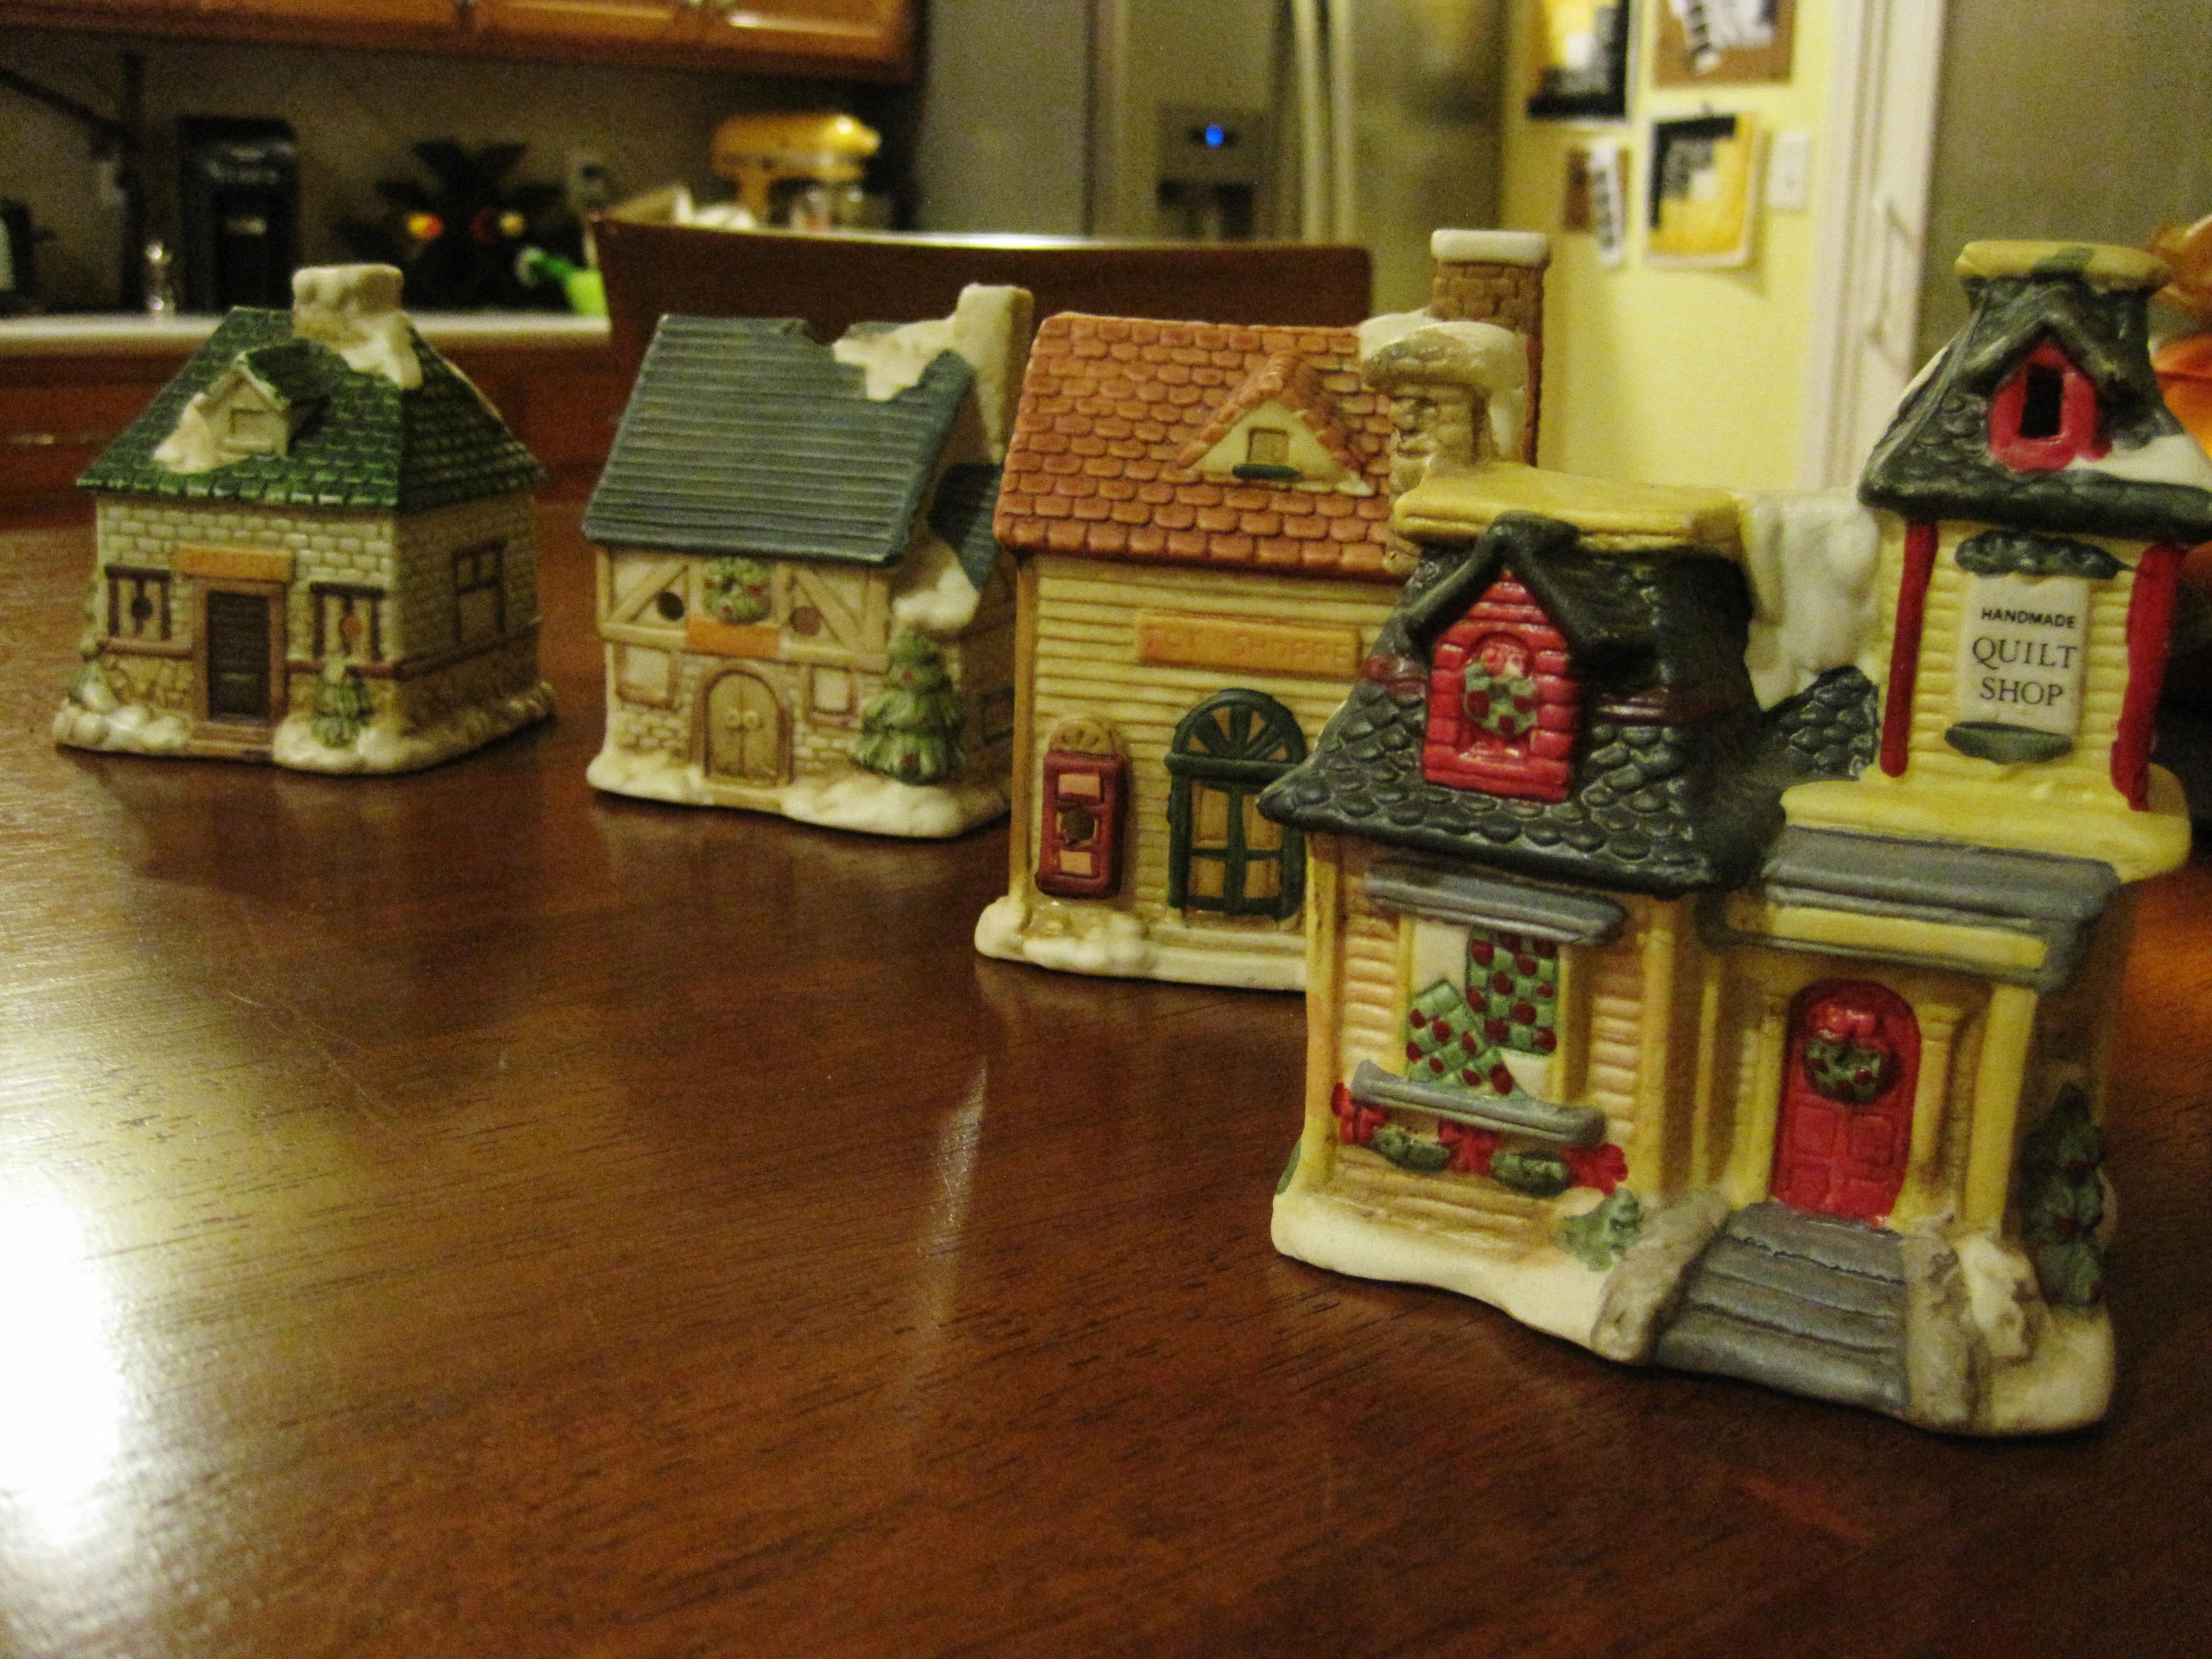 I'm Dreaming of Some White Christmas Houses - Loving Here